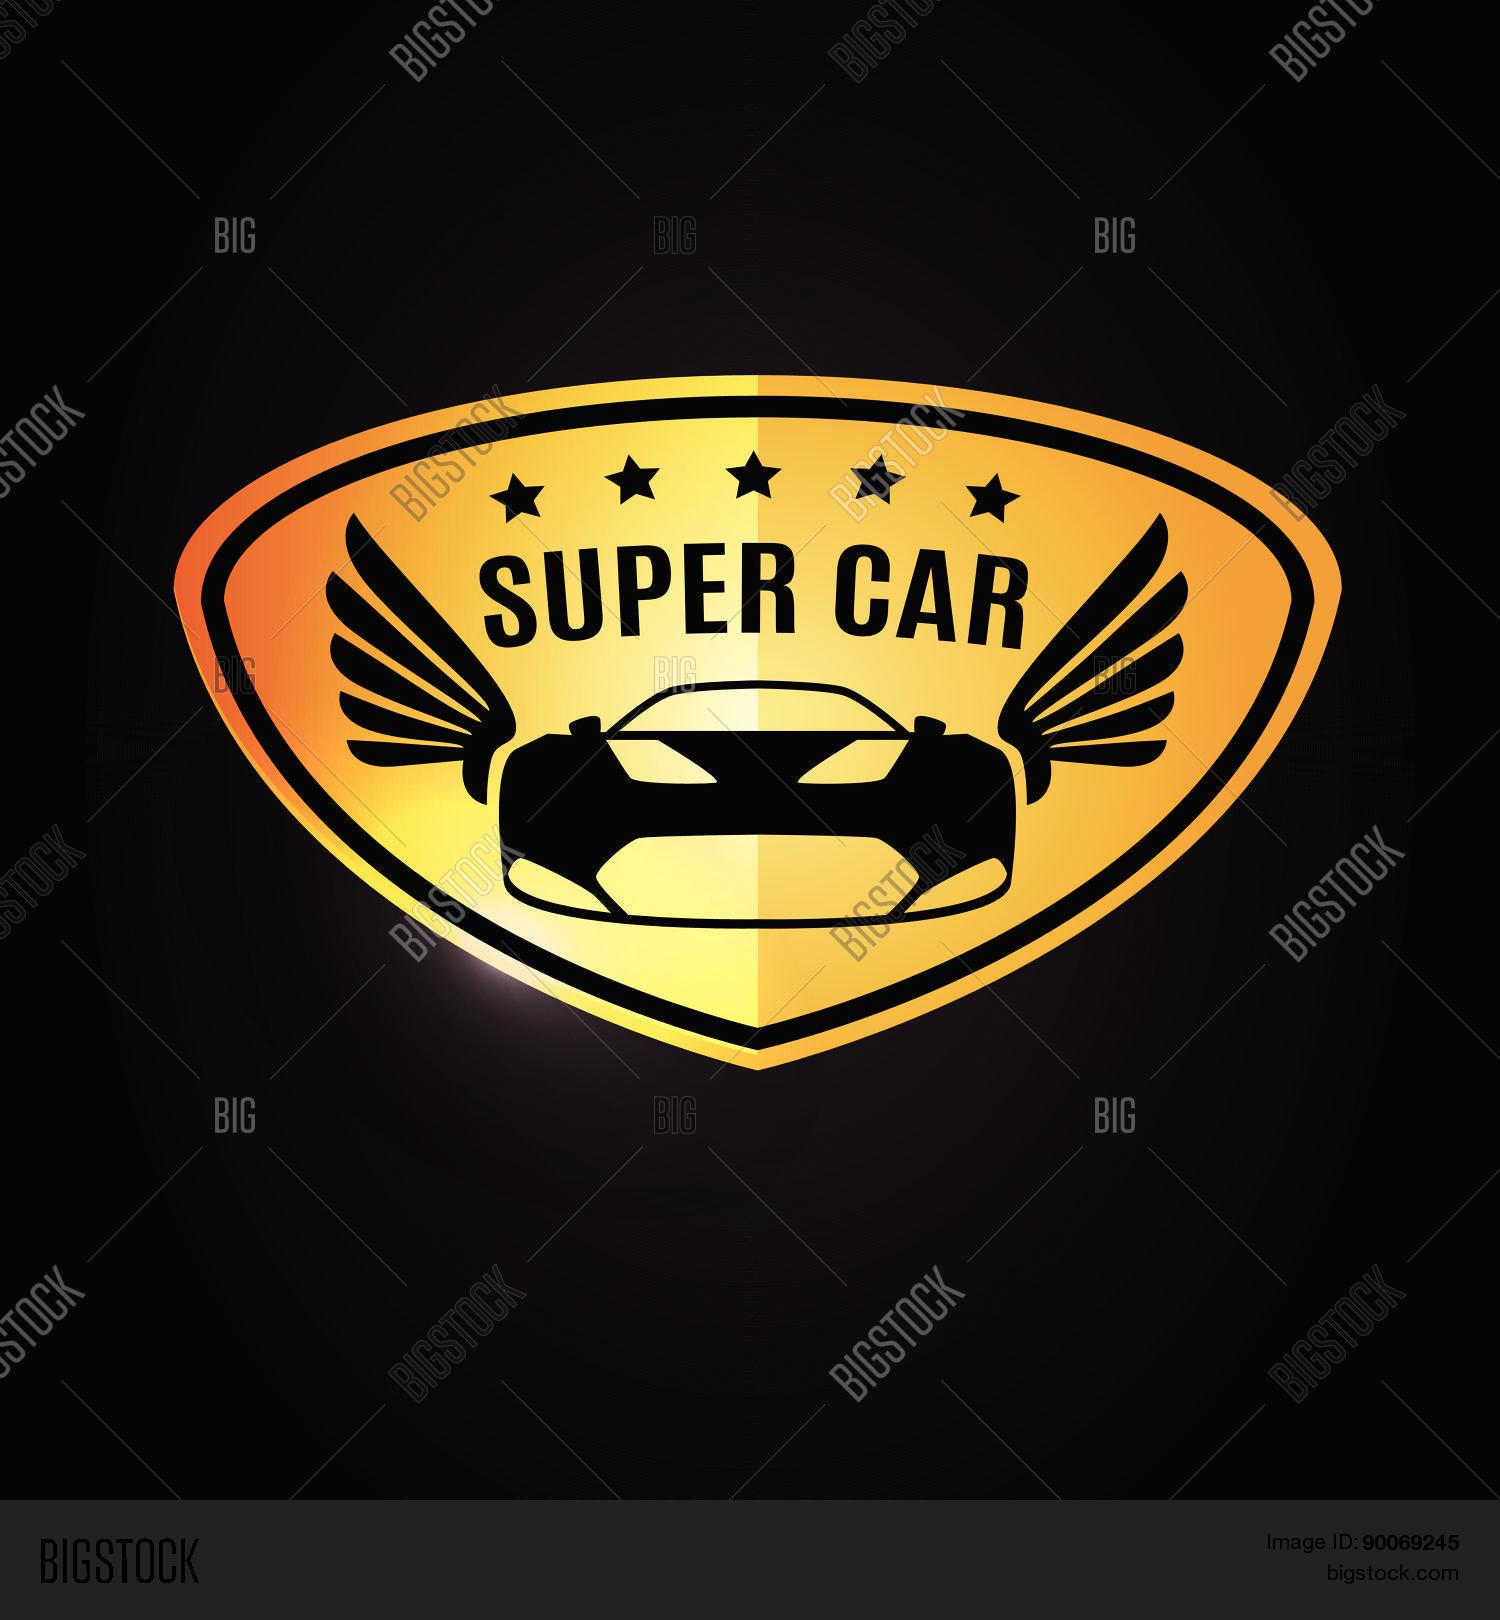 Sports Car Vehicle Vector Photo Free Trial Bigstock